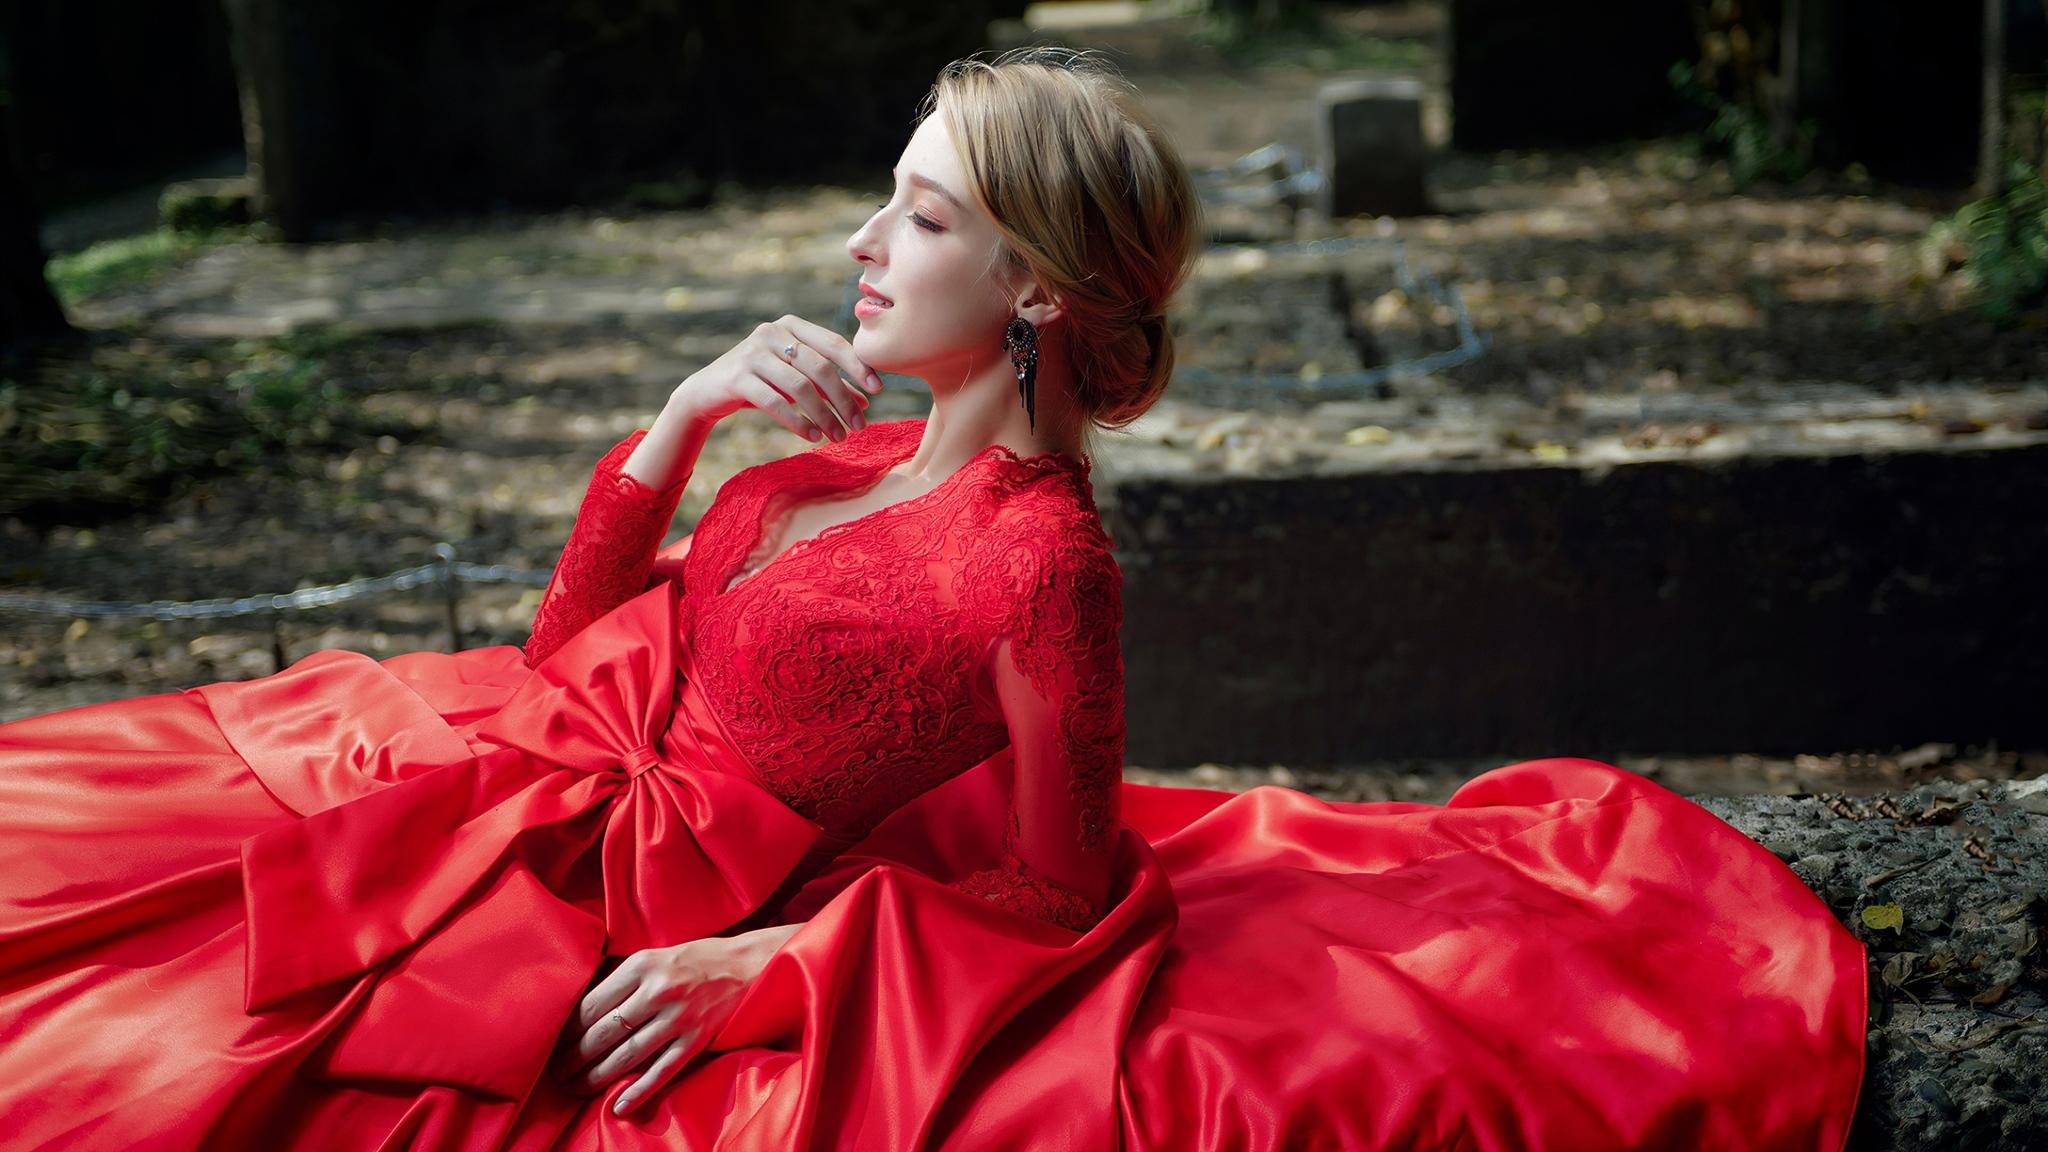 red-dress-model-lying-closed-eyes-4k-mc.jpg